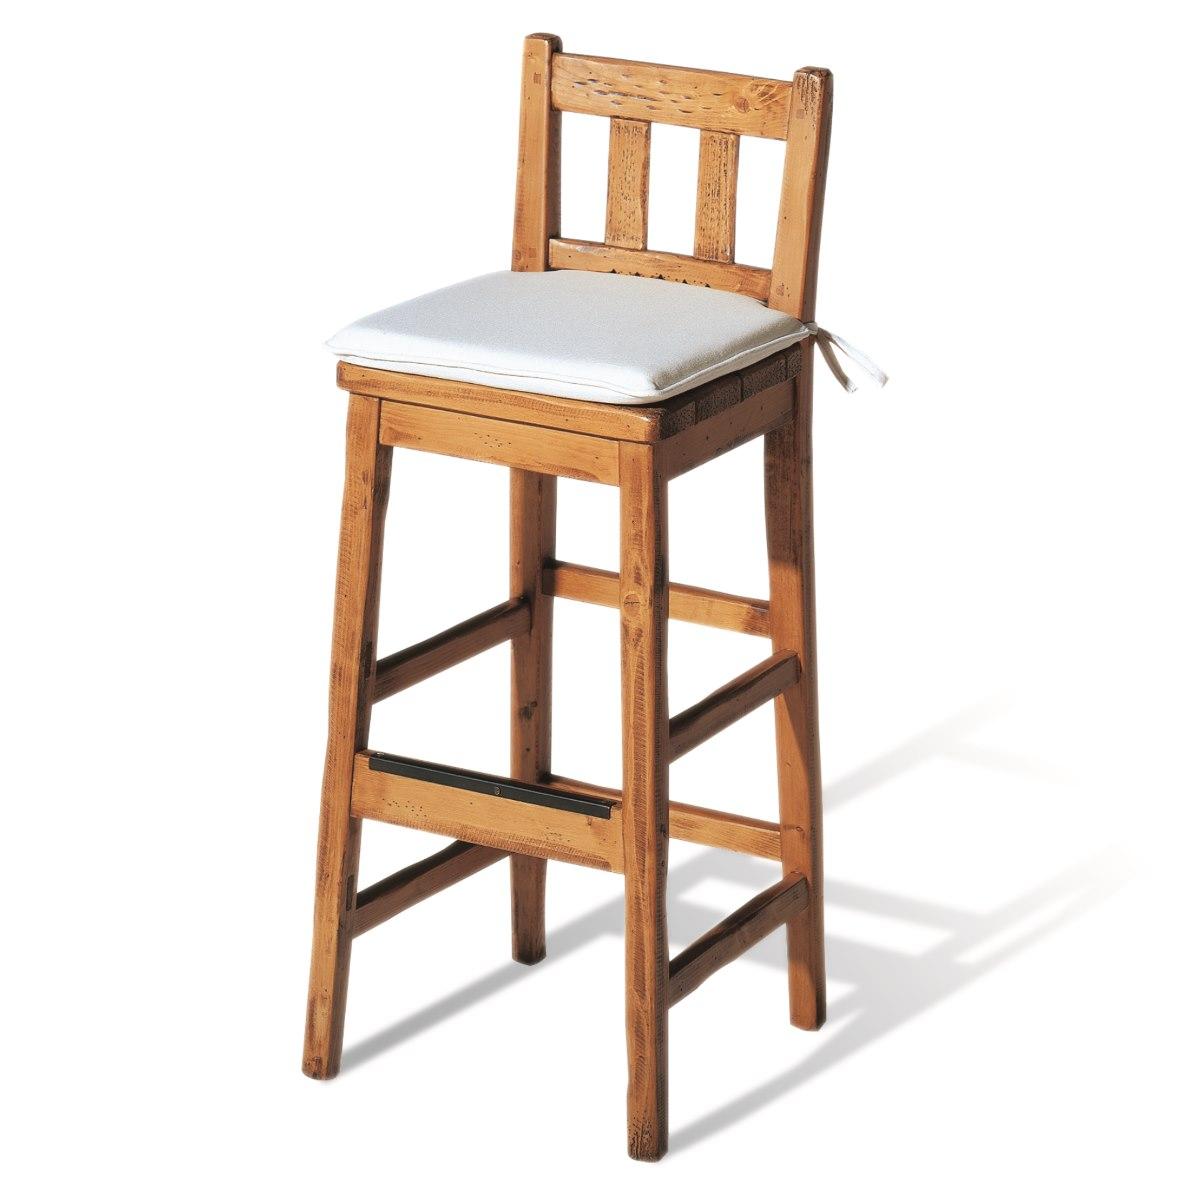 Taburete bar r stico de madera ecor stico venta de muebles - Taburetes rusticos ...